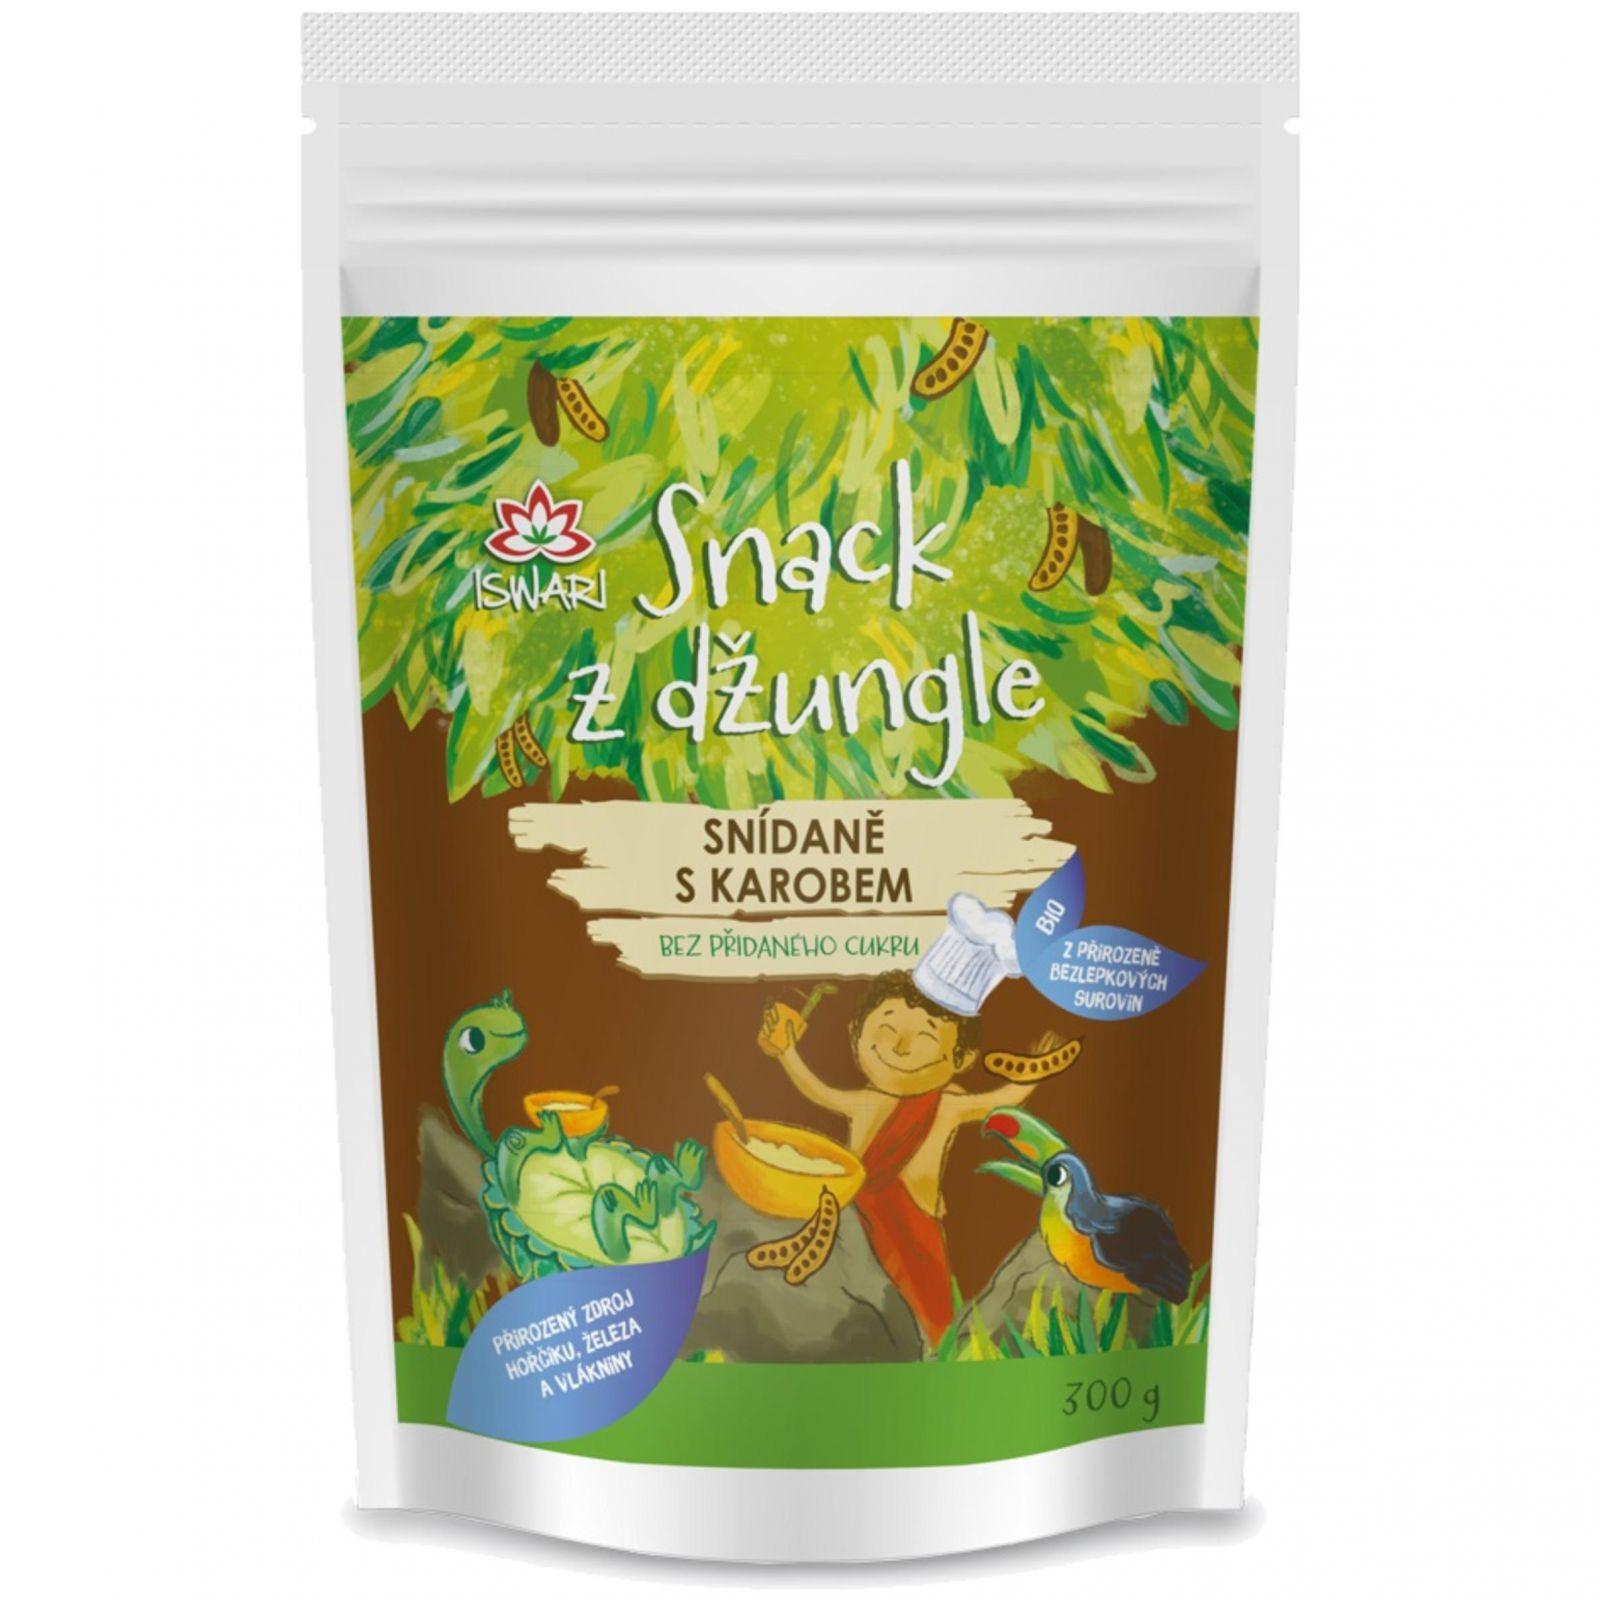 Iswari BIO Snack z džungle 300 g - snídaně s karobem